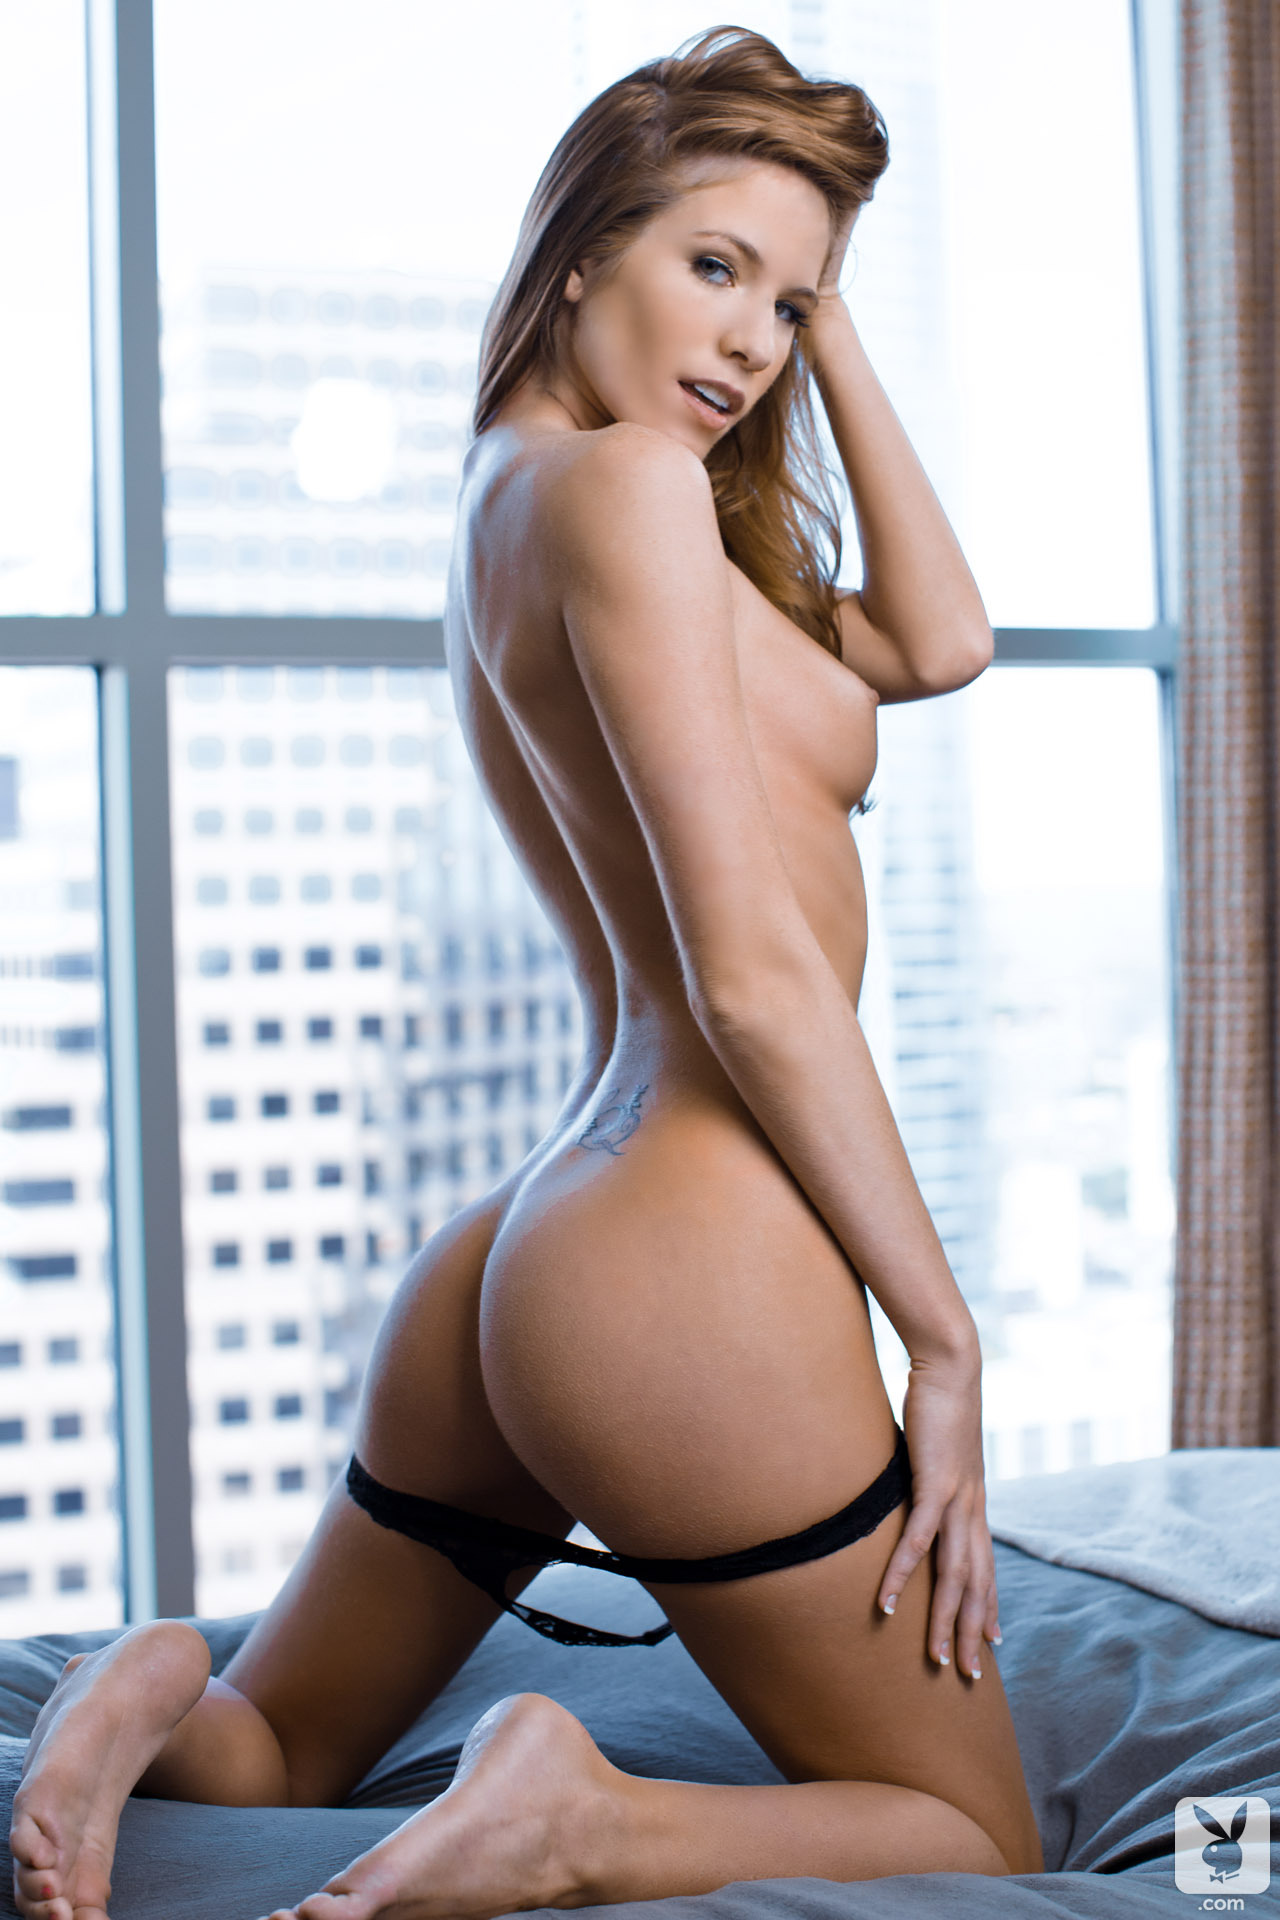 bree-morgan-nude-apartment-redhead-playboy-10